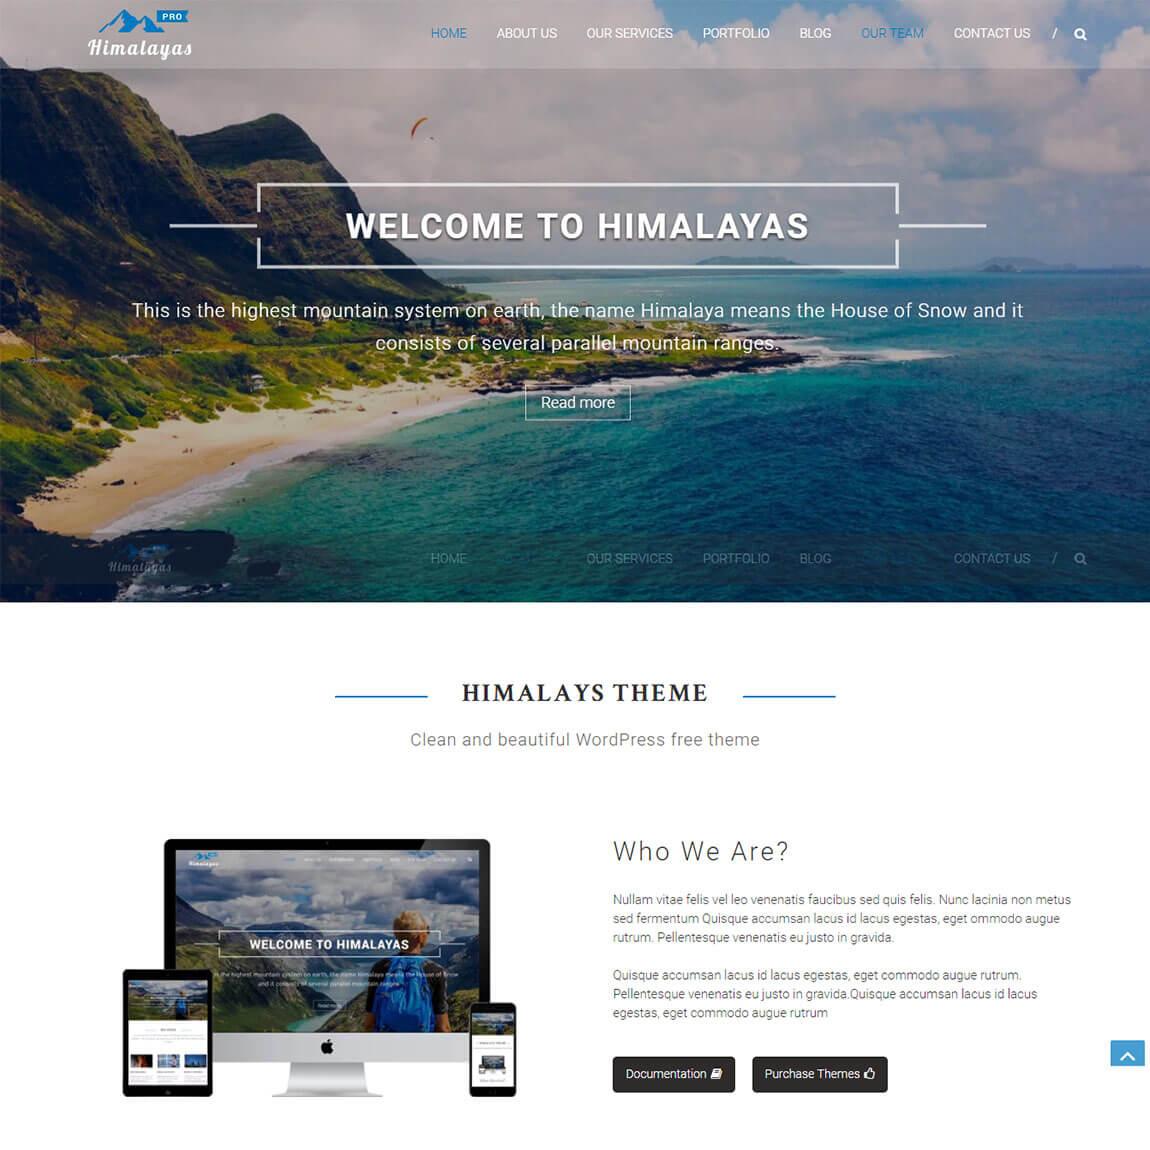 Himalayas-wordpress-one-page-parallax-theme